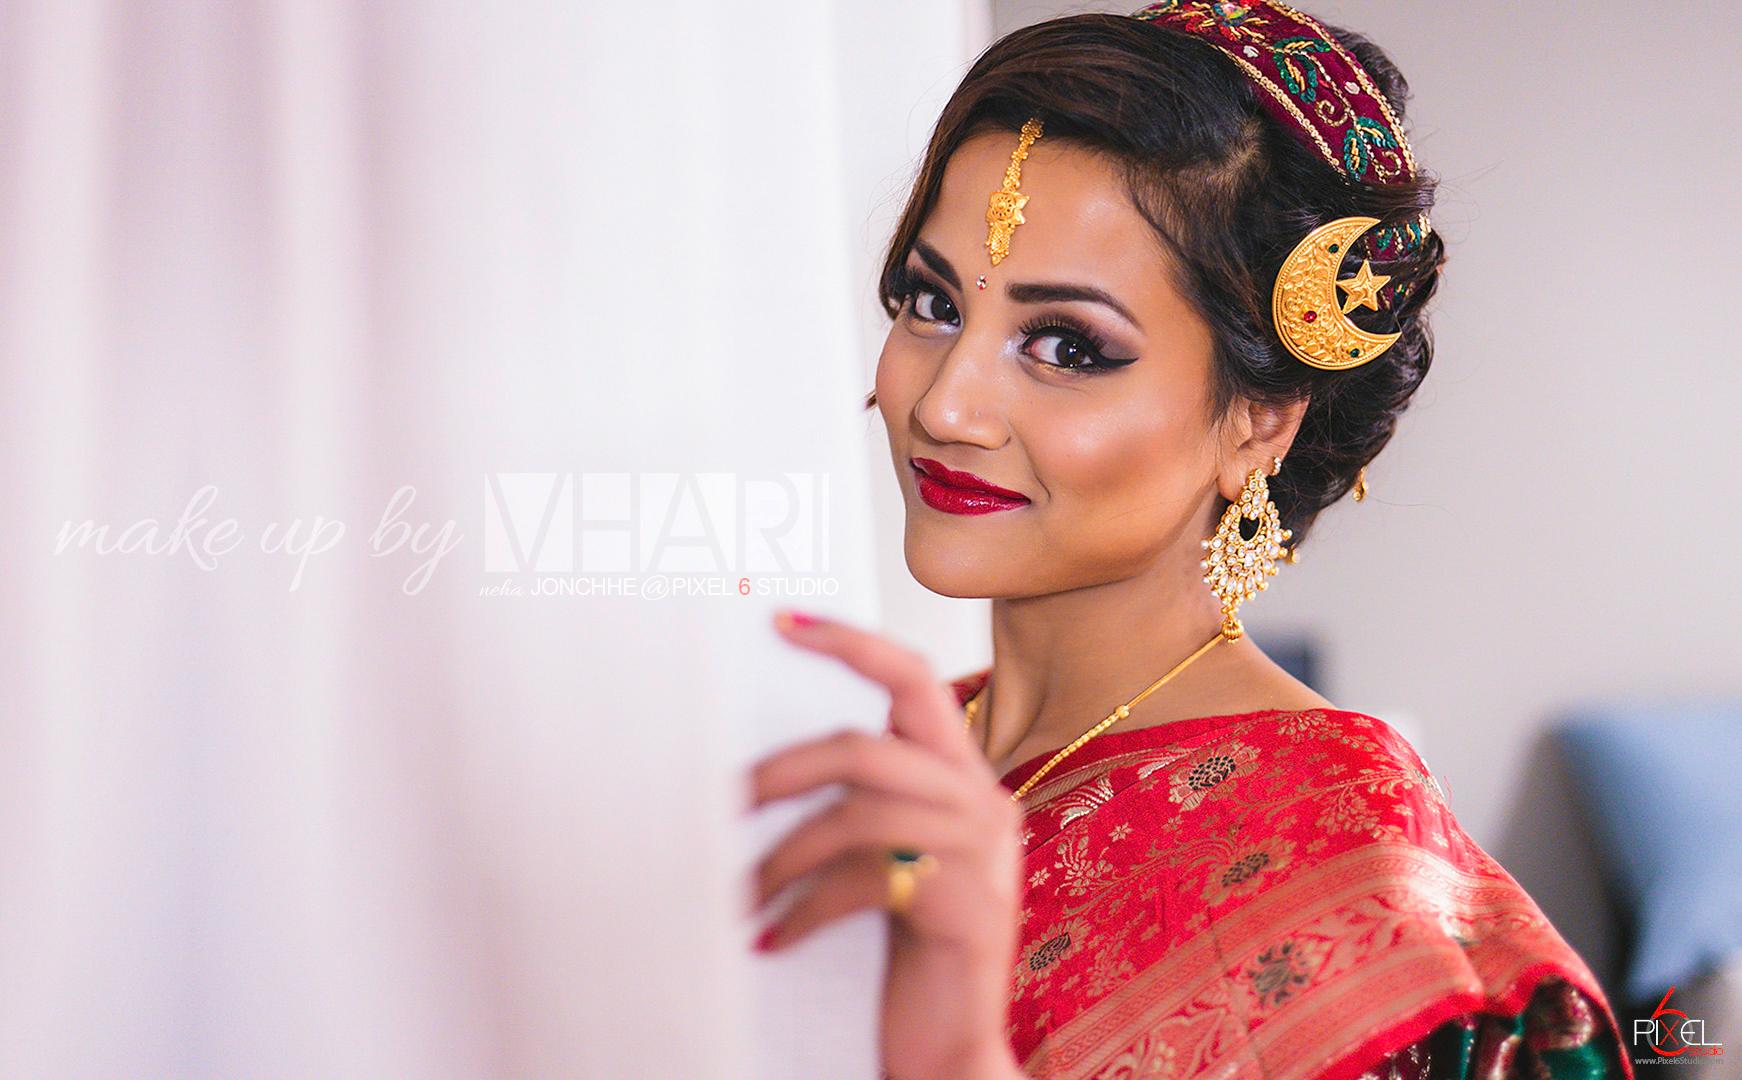 Bridal Session With Makeup By Vhari Pixel 6 Studio